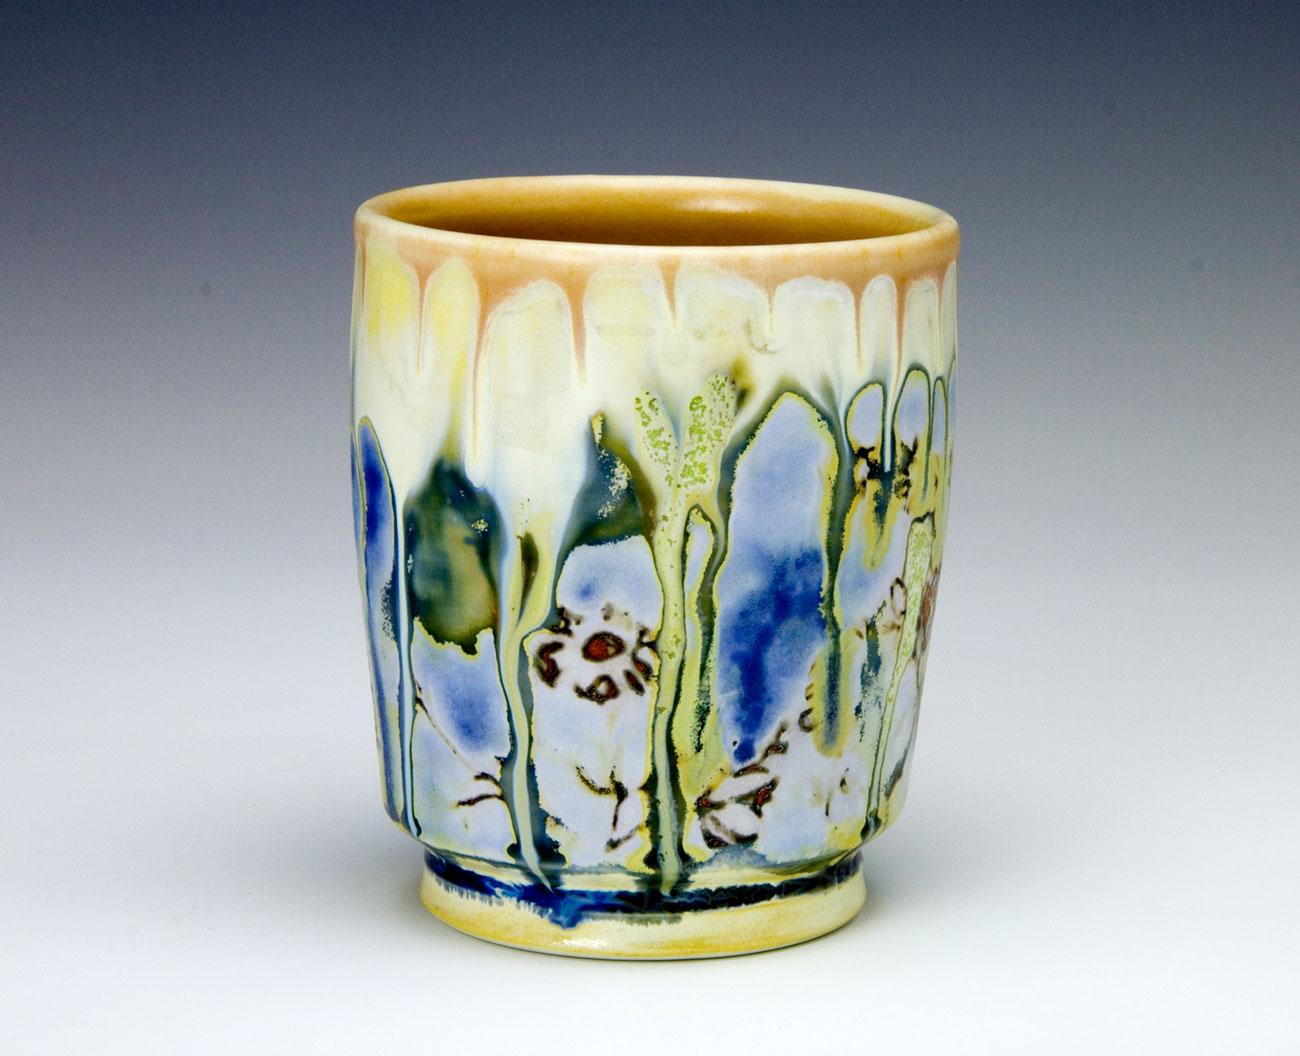 Abstract-floral-art-flow-cup-Samantha-Henneke.jpg